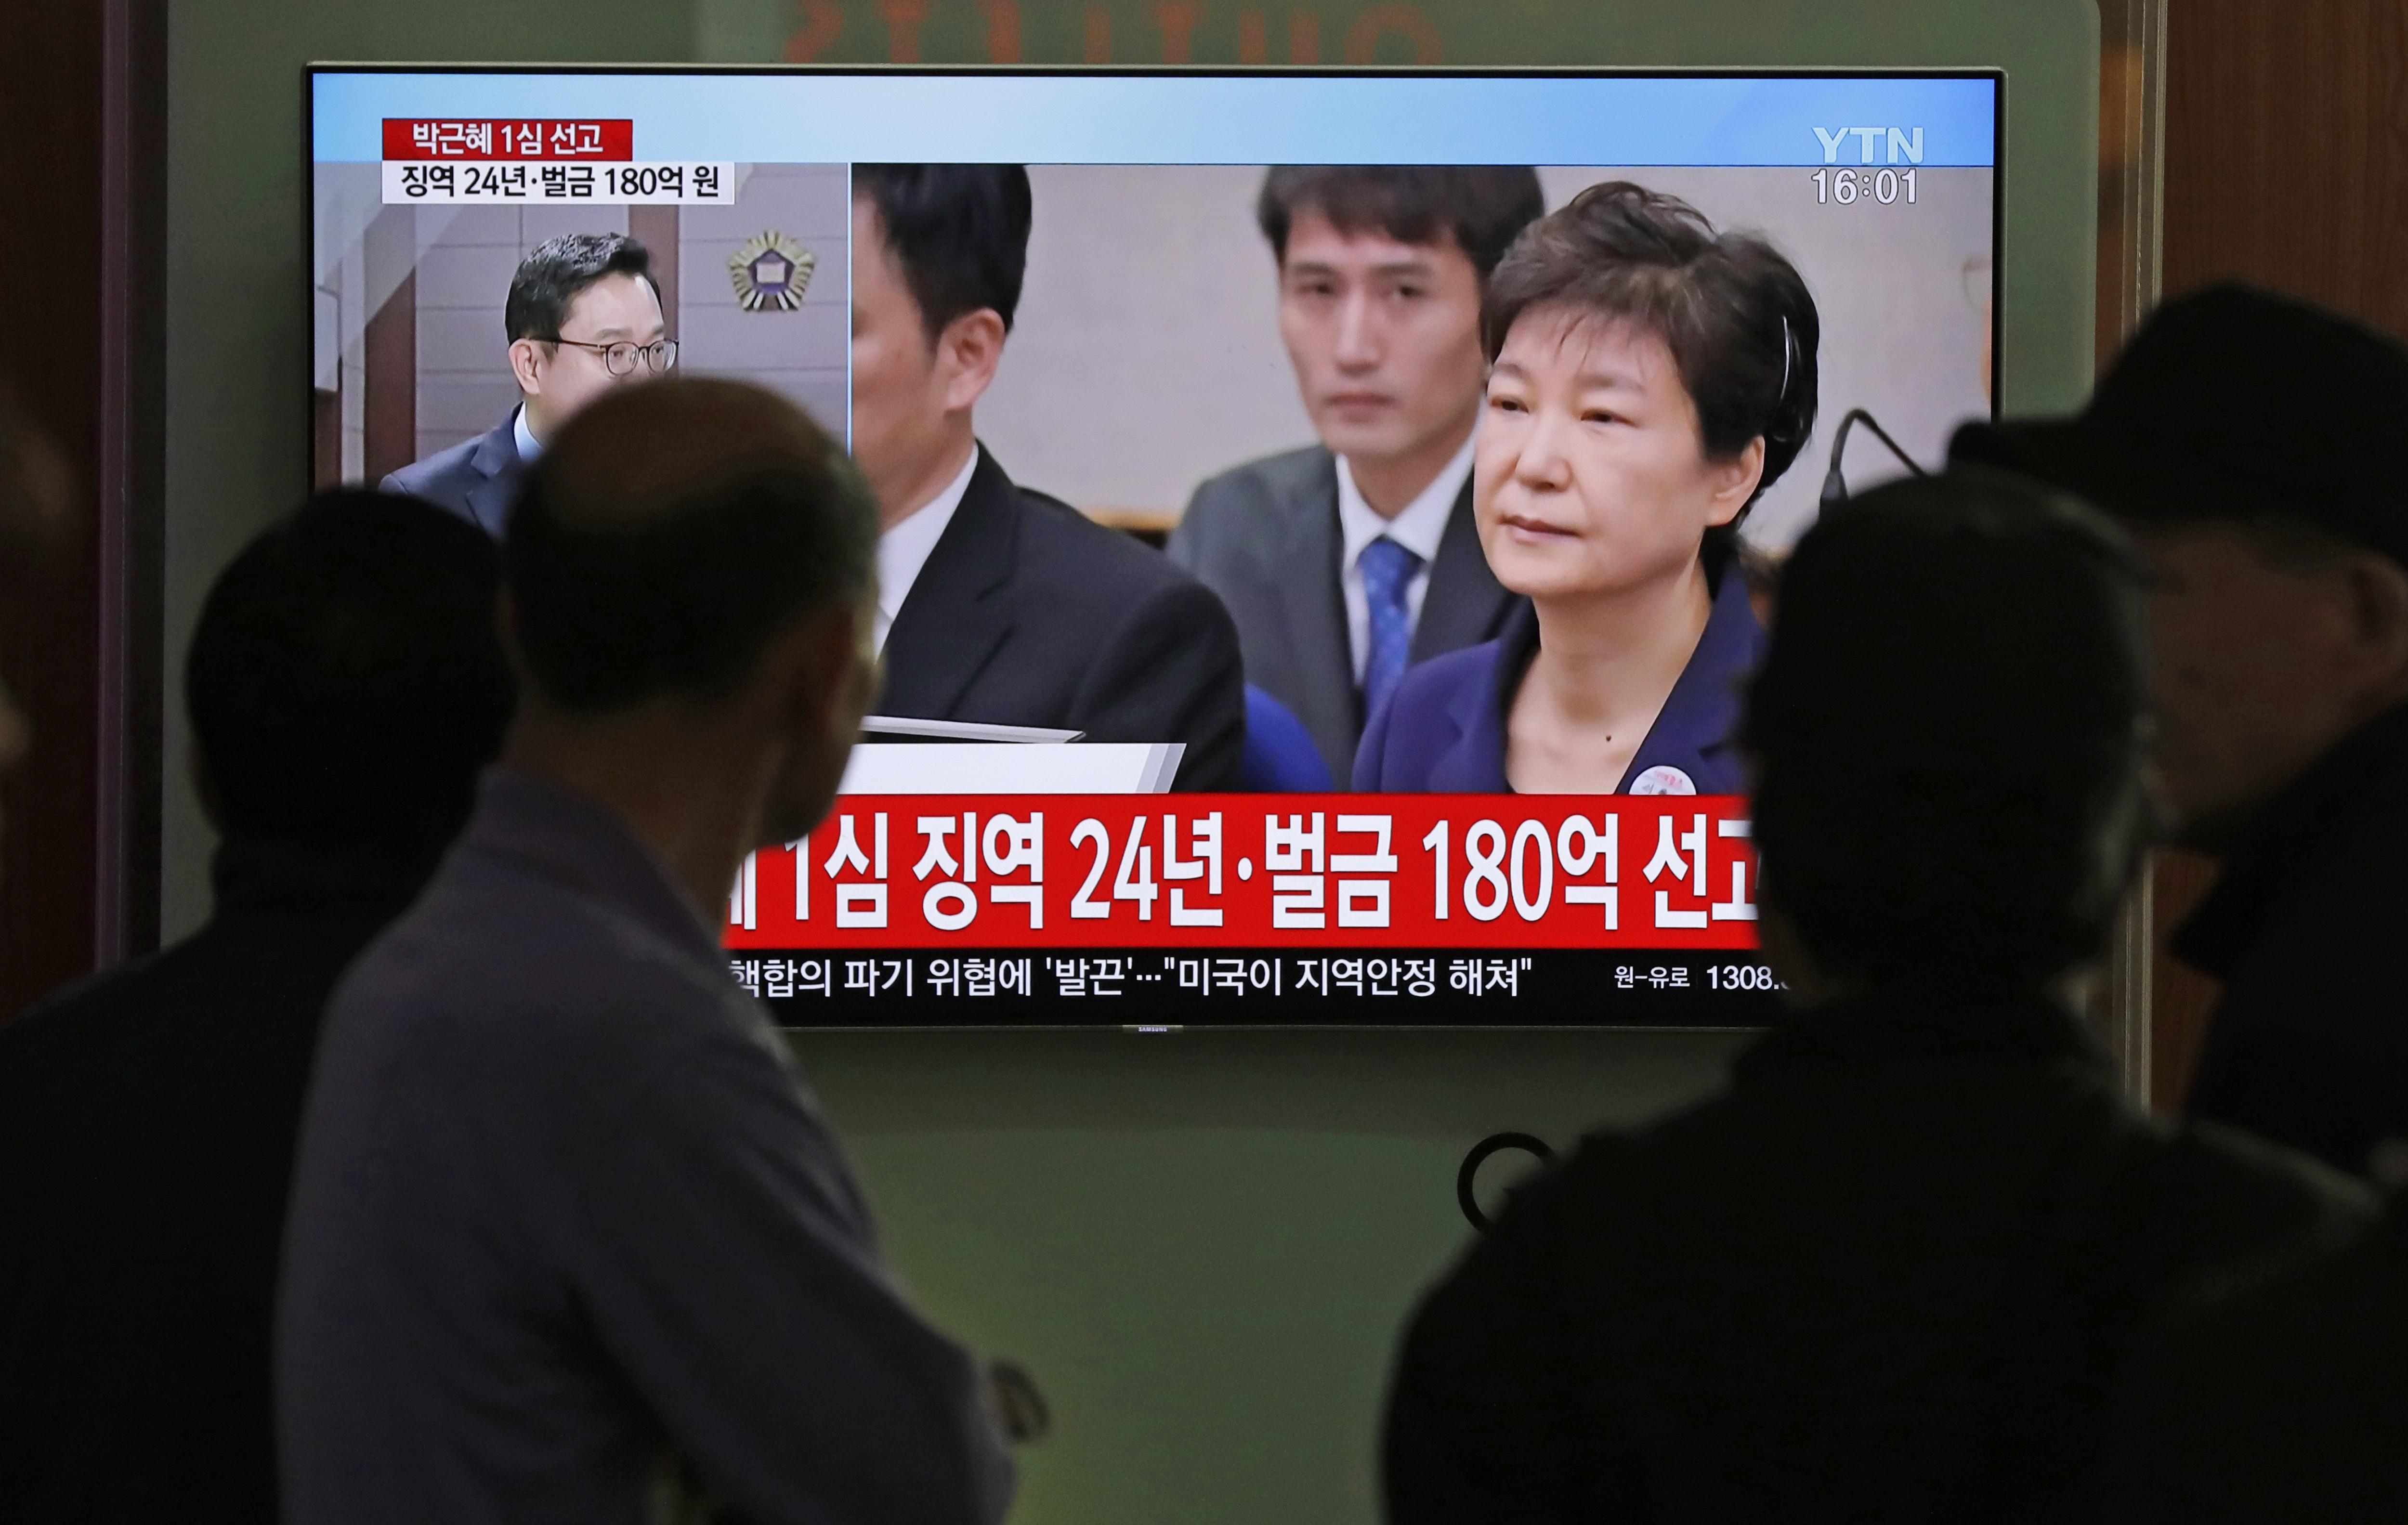 Former Korean president Park Geun-hye's blacklist of artists filled